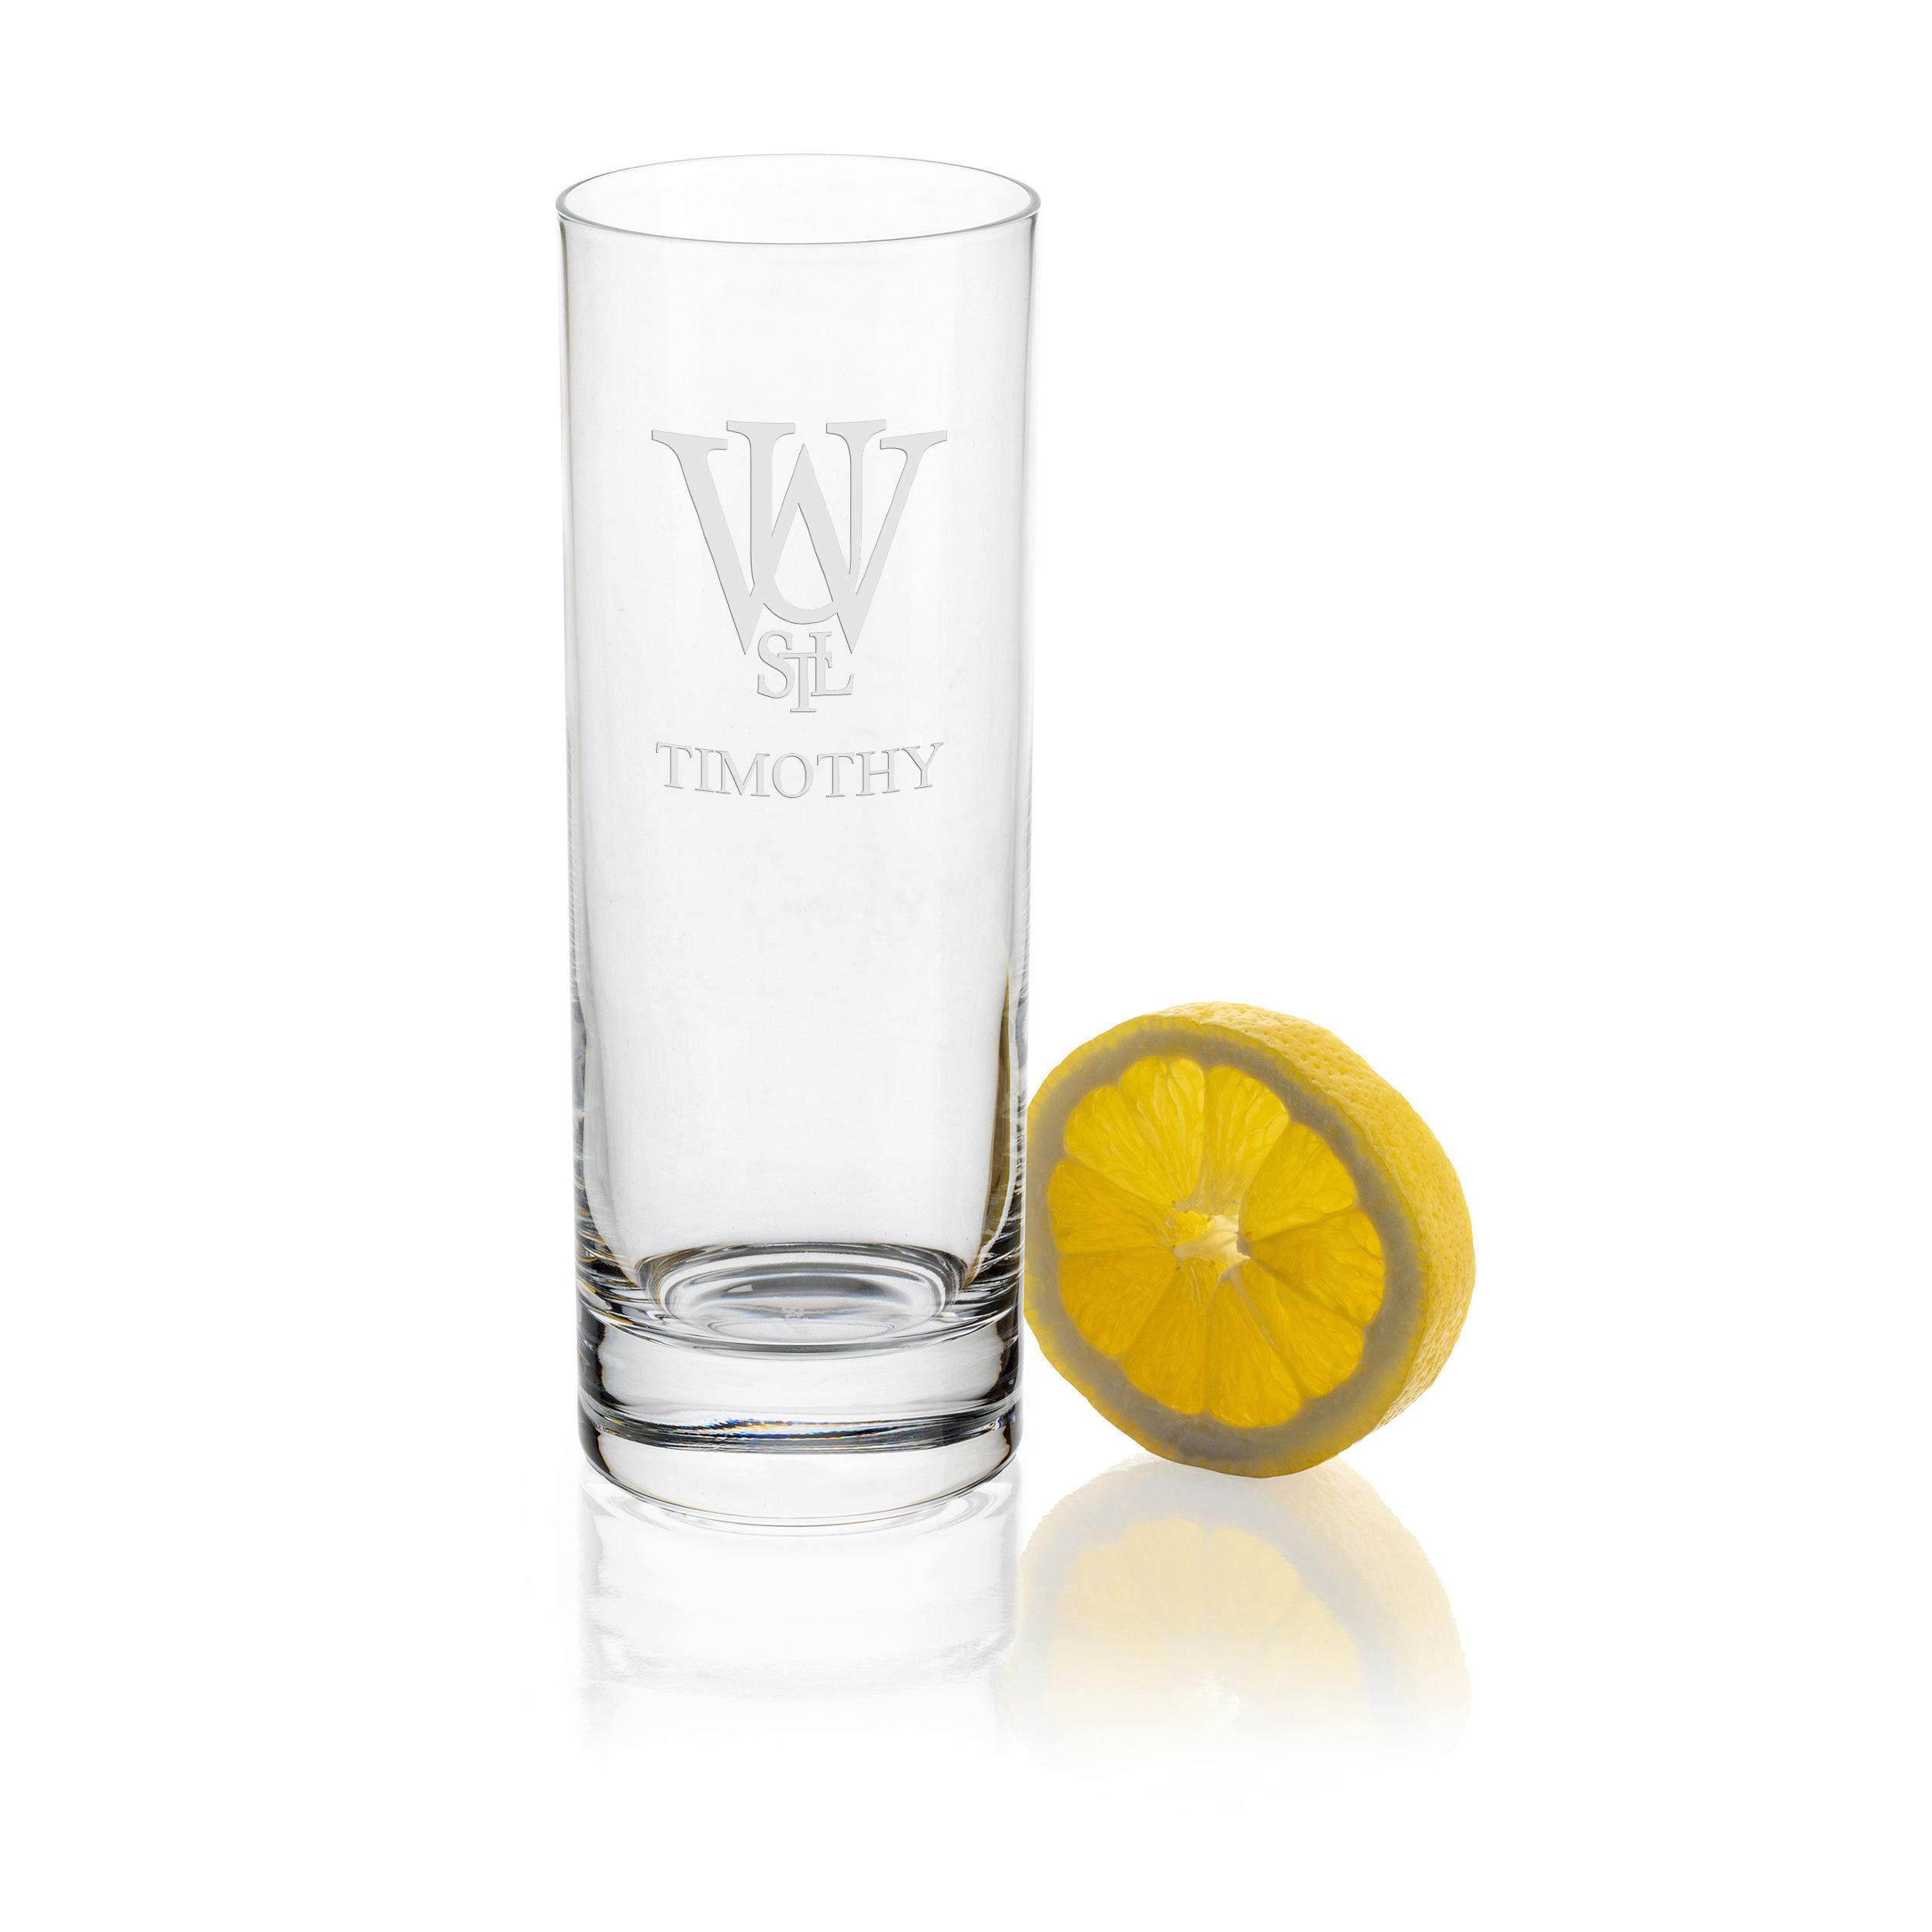 WUSTL Iced Beverage Glasses - Set of 4